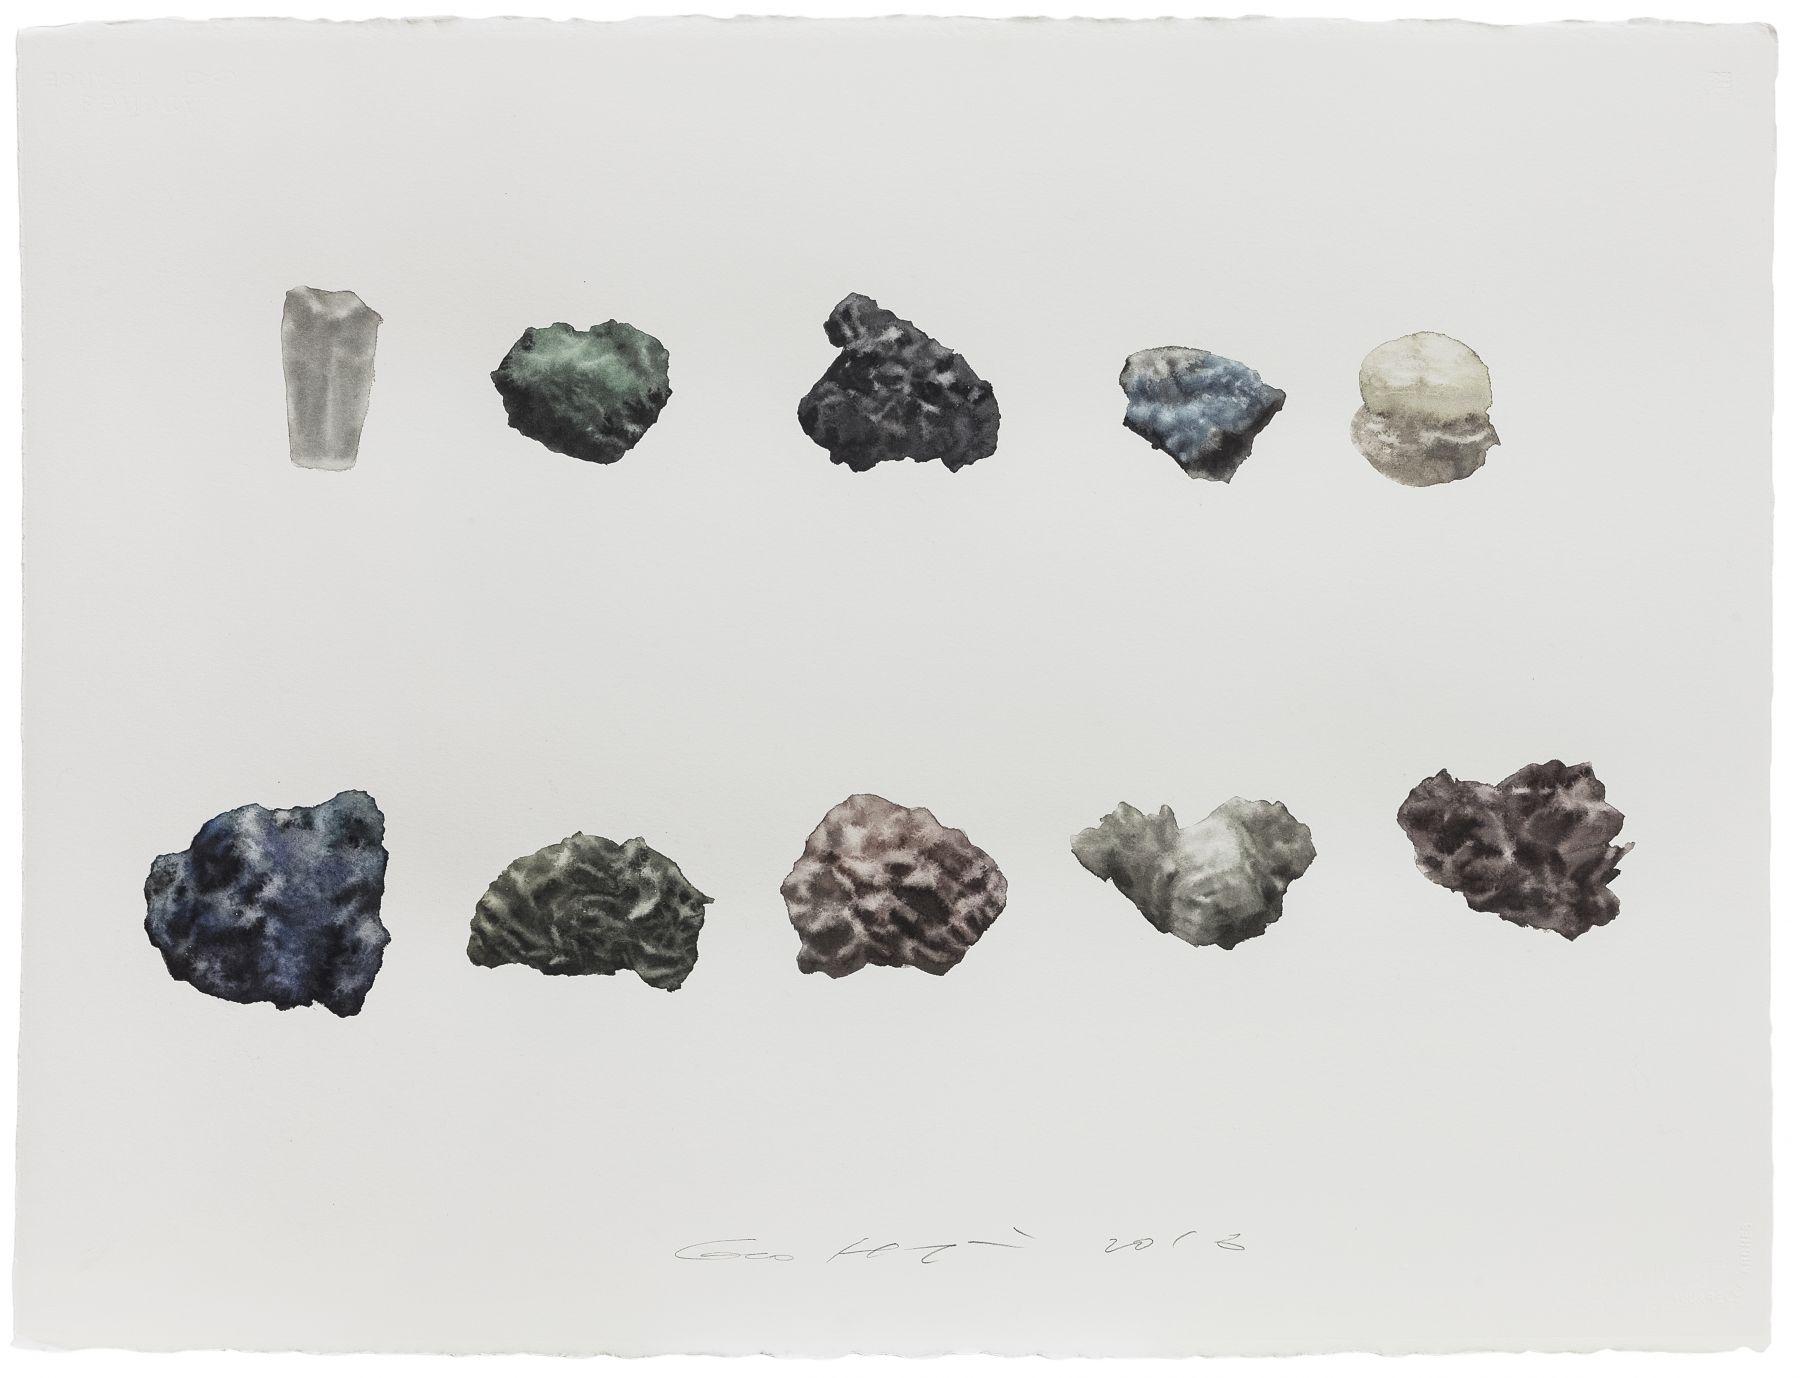 Stone No. 13 石 13, 2016